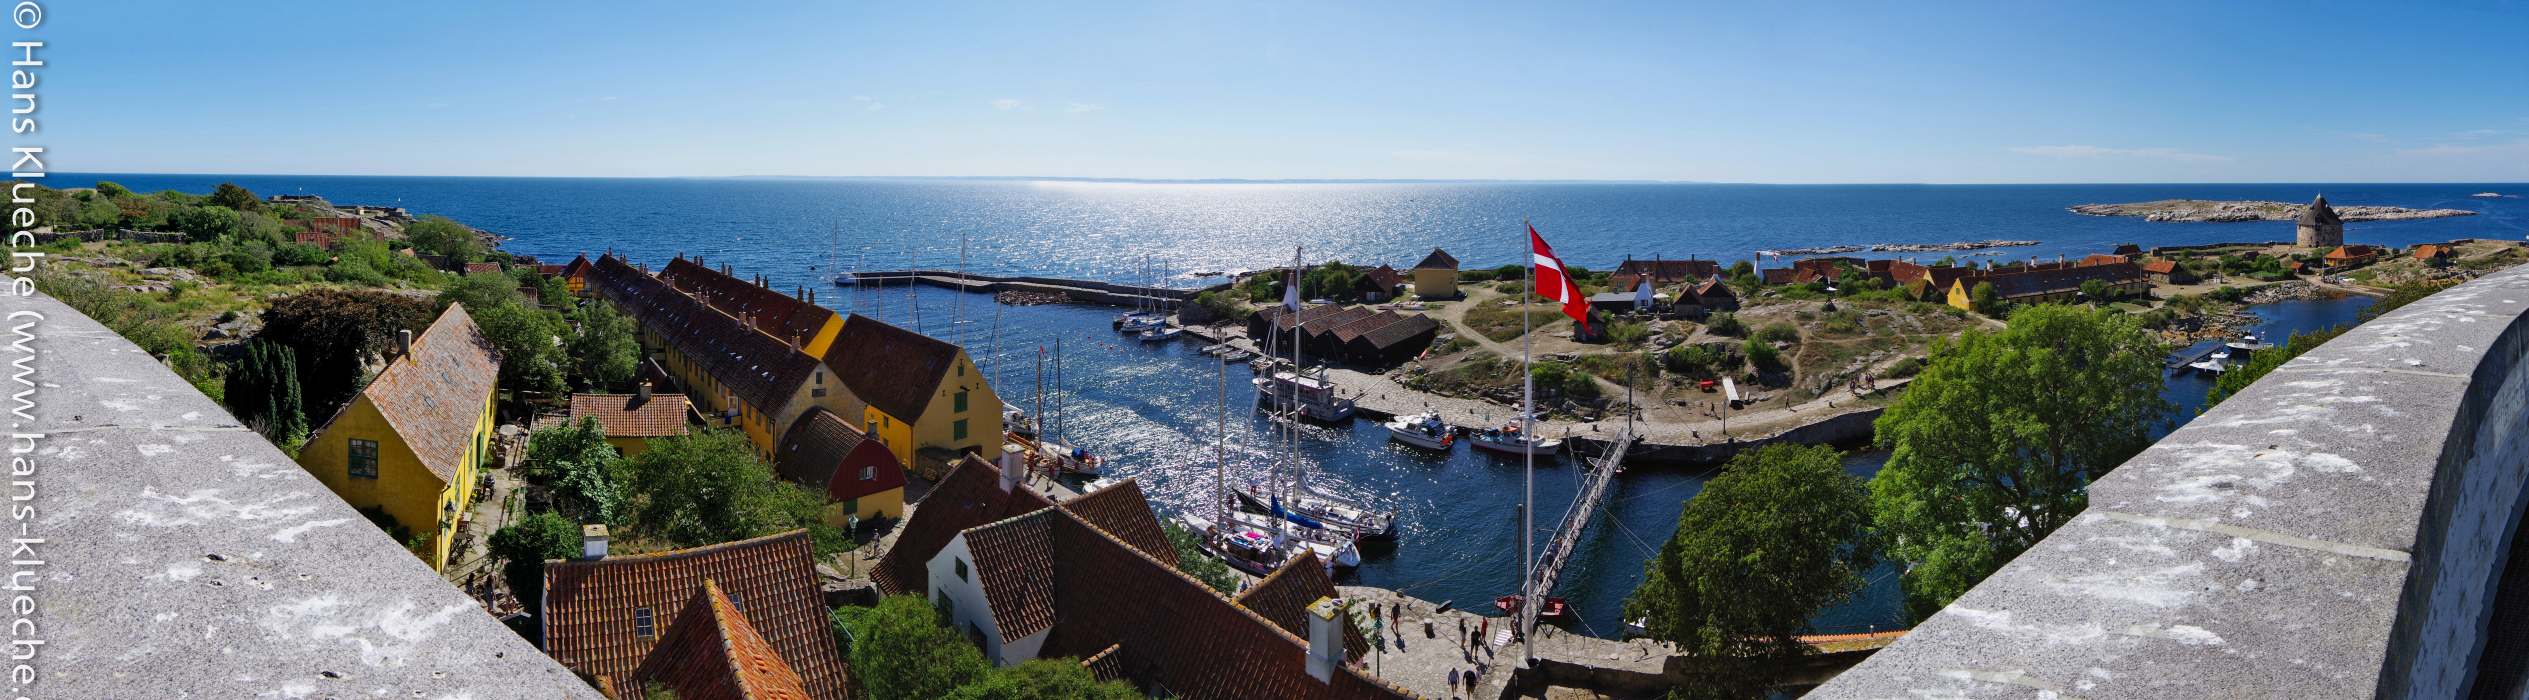 Christiansø, Frederiksø und Græsholm